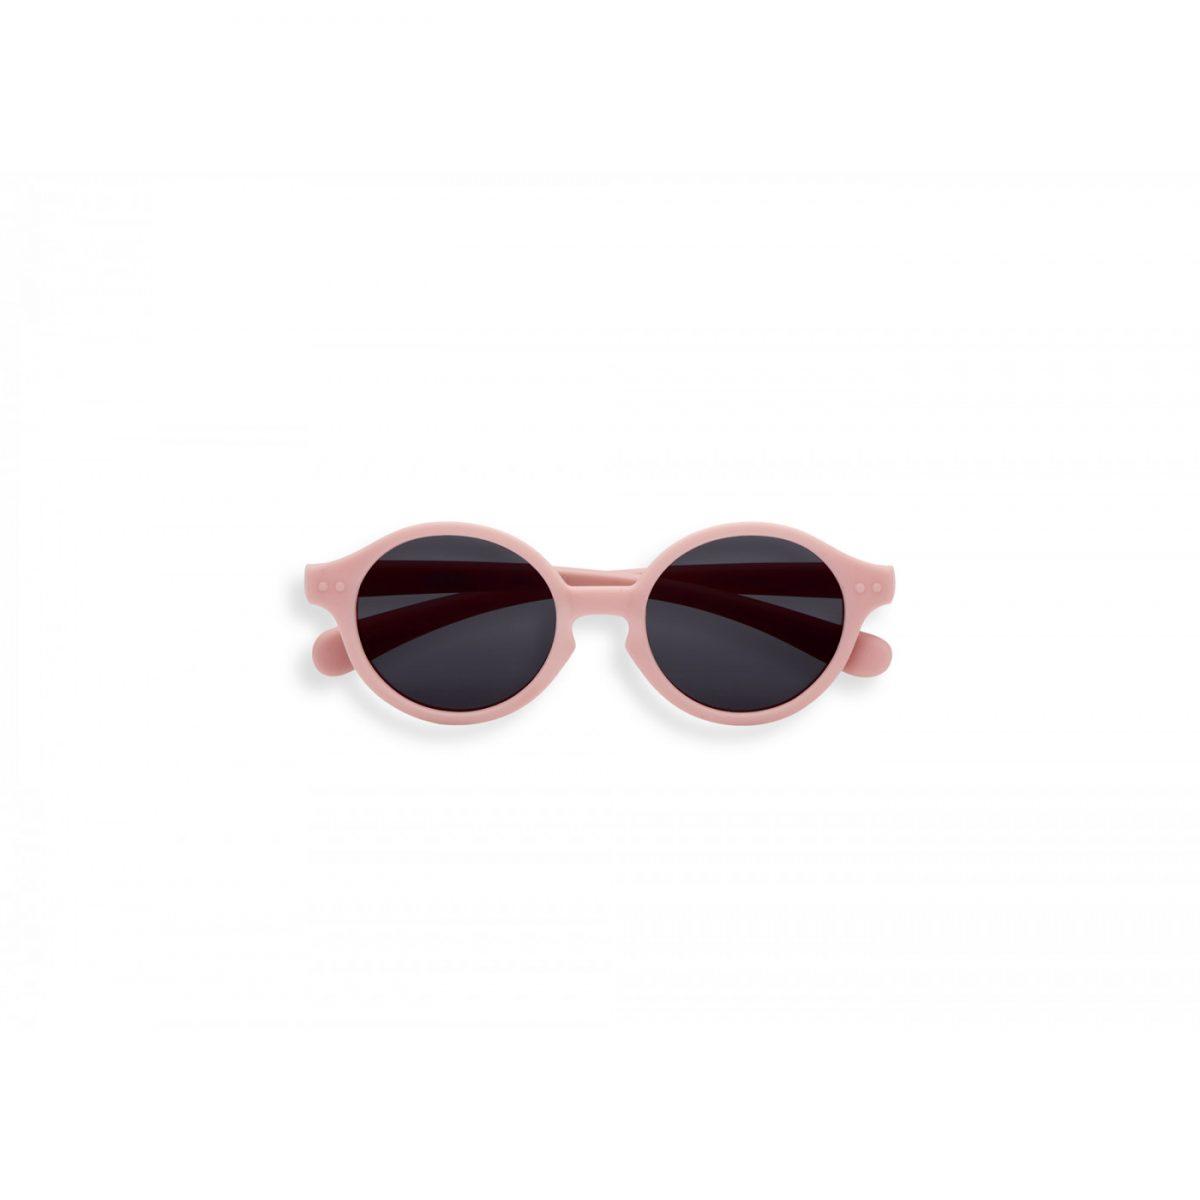 sun-baby-pastel-pink-sunglasses-baby